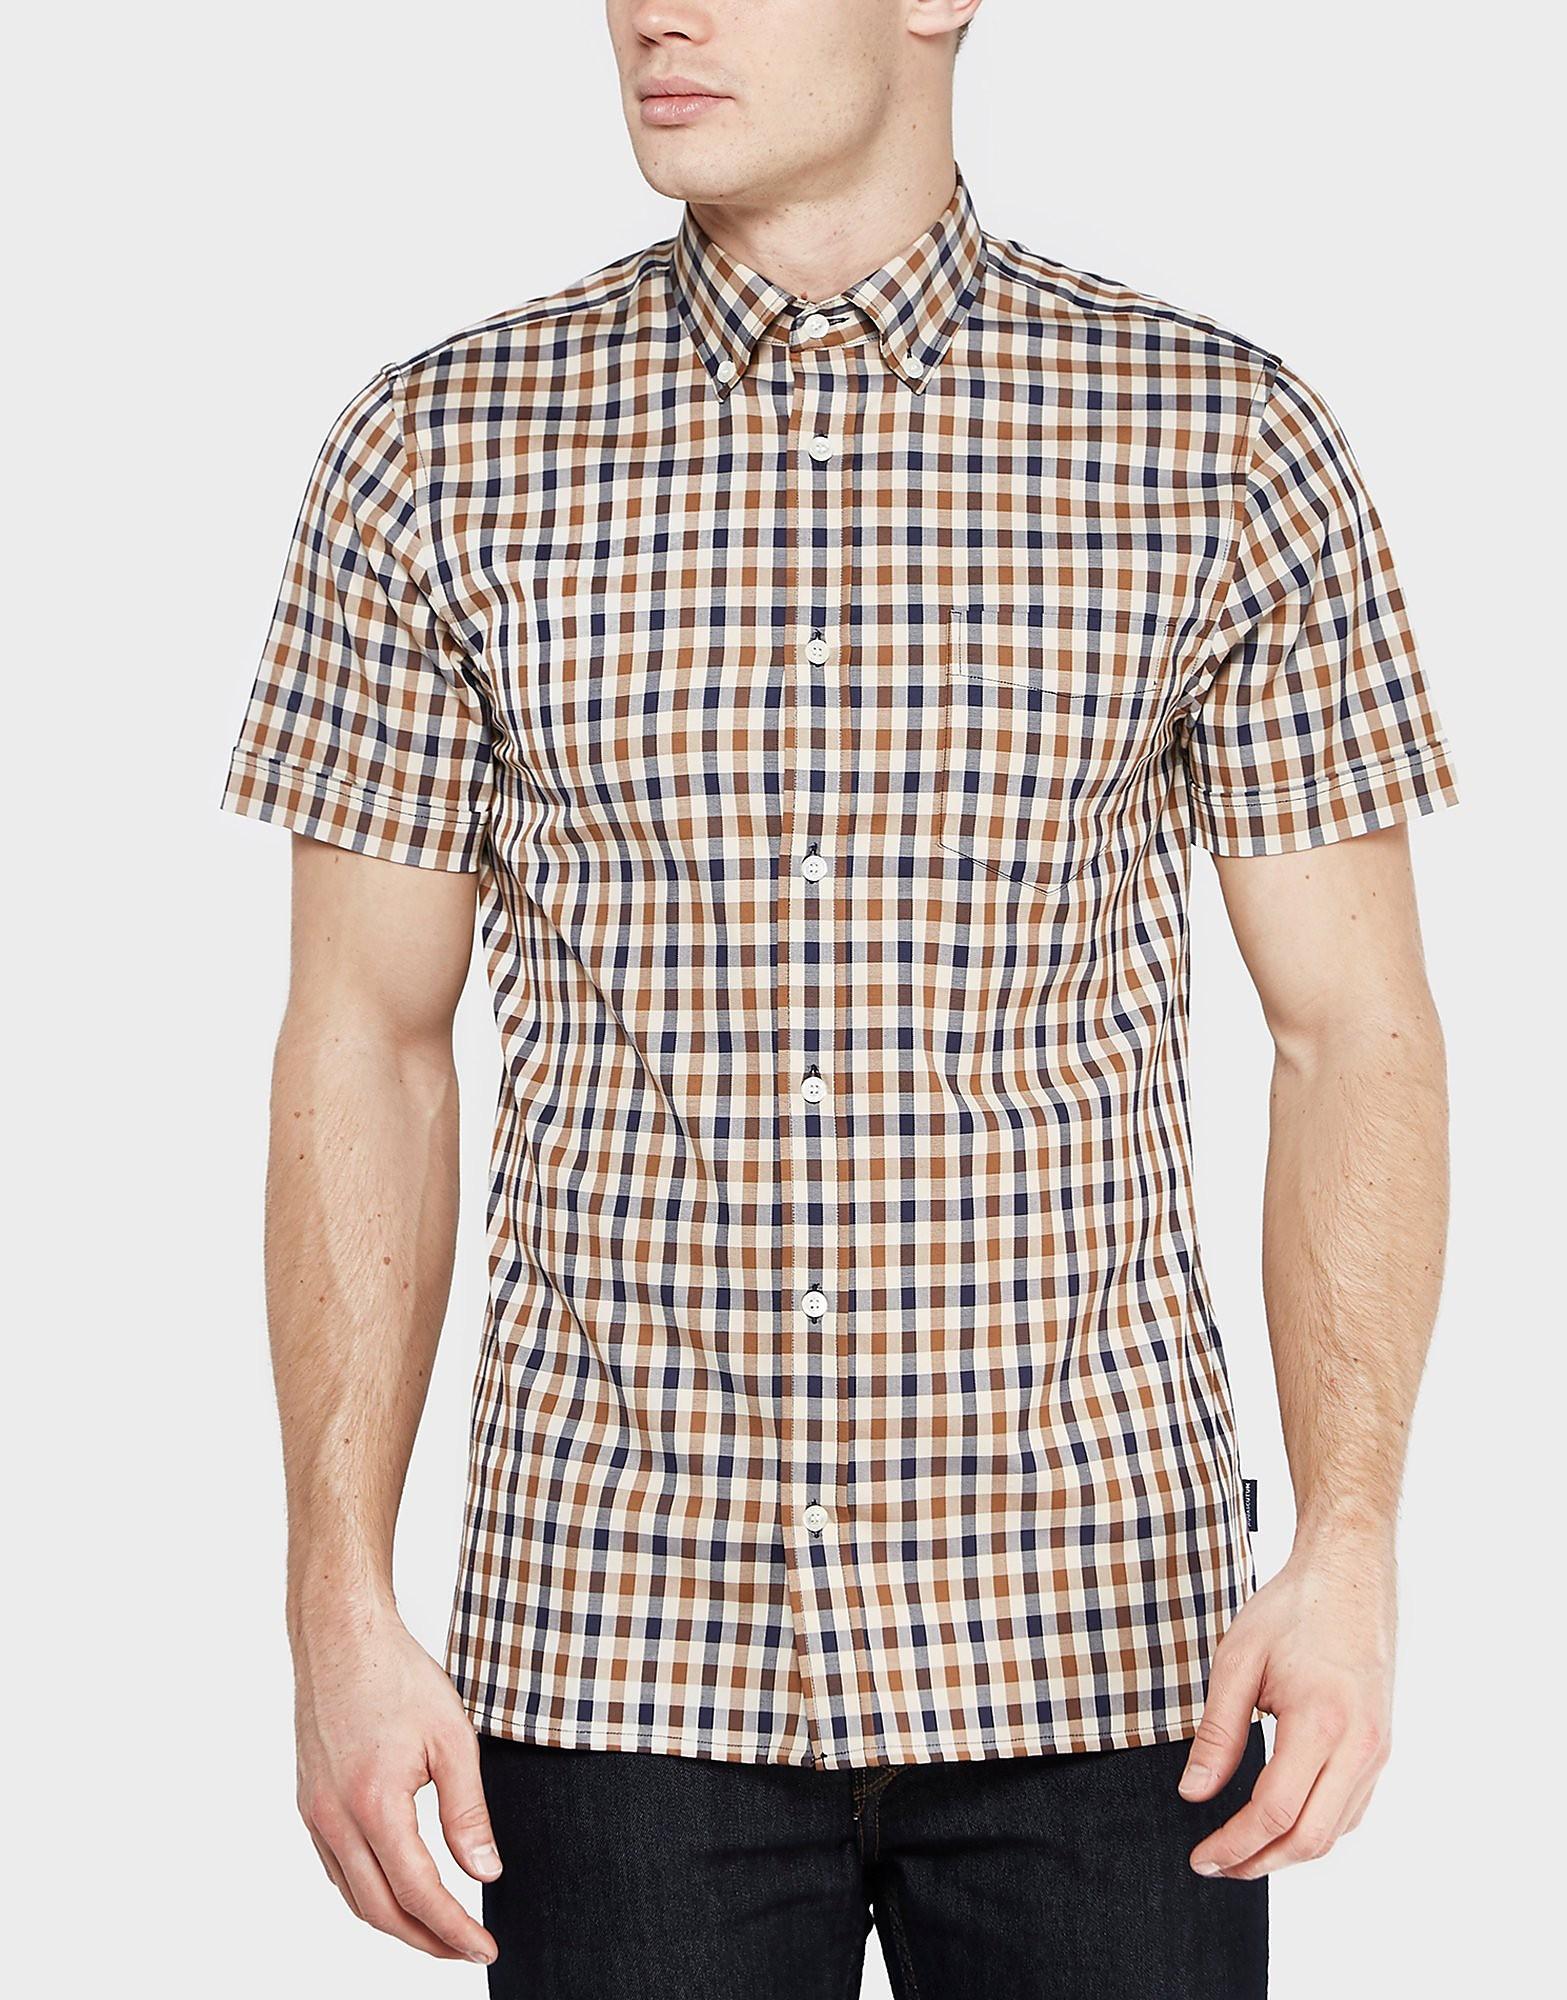 Aquascutum Short Sleeve Check Shirt